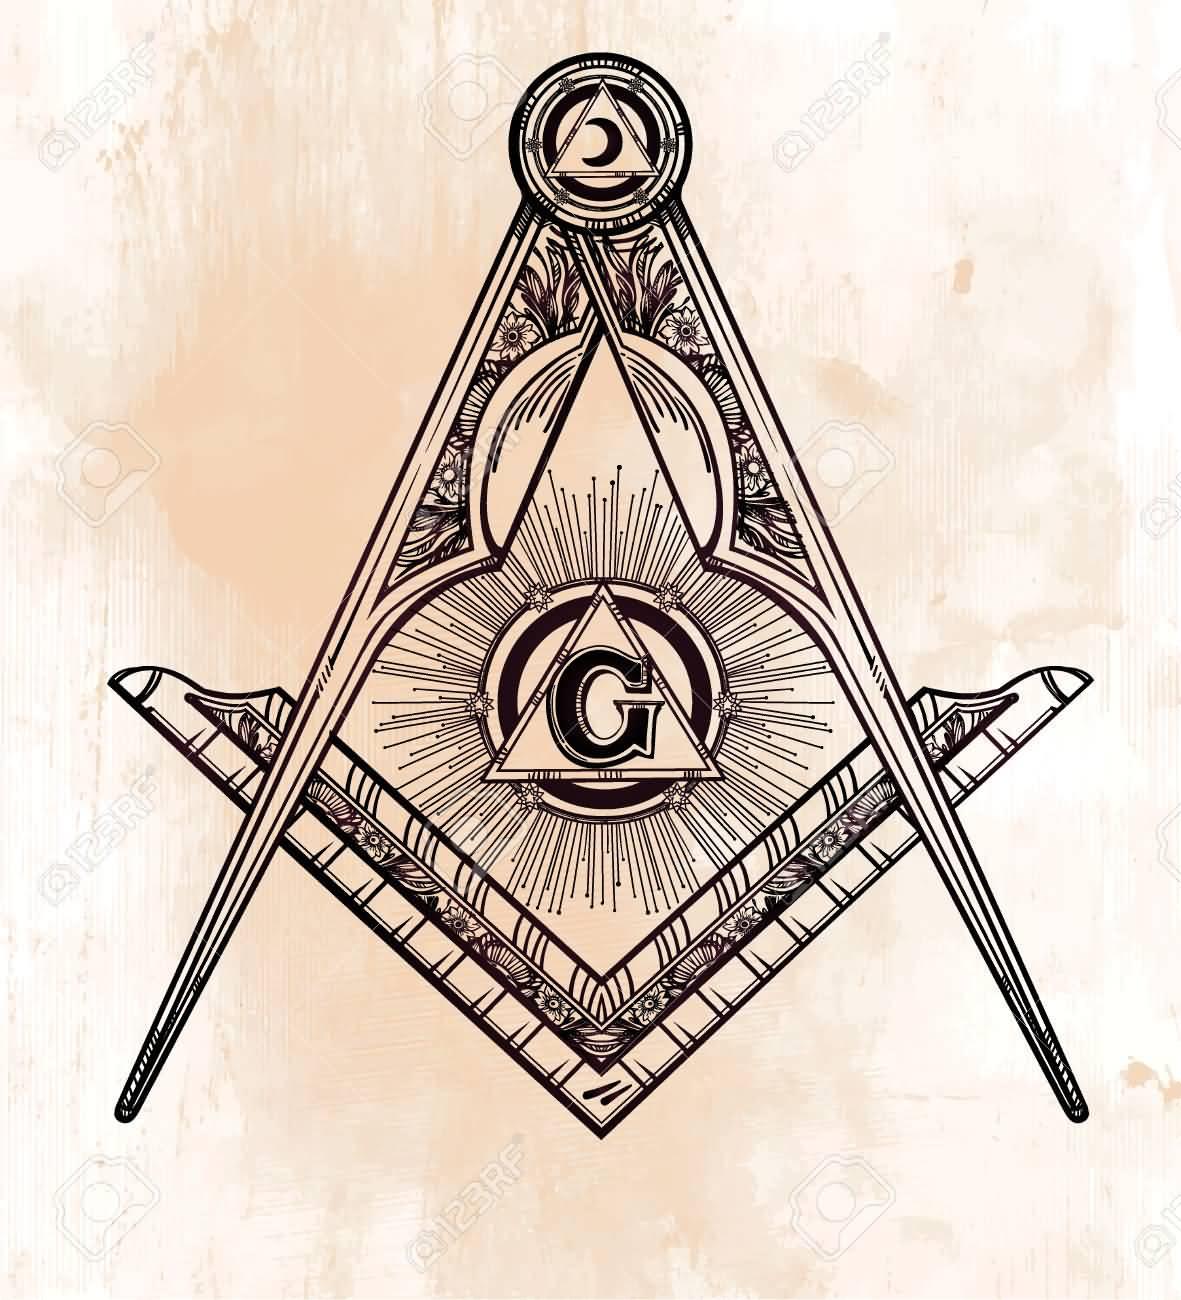 12 masonic symbol tattoo designs. Black Bedroom Furniture Sets. Home Design Ideas